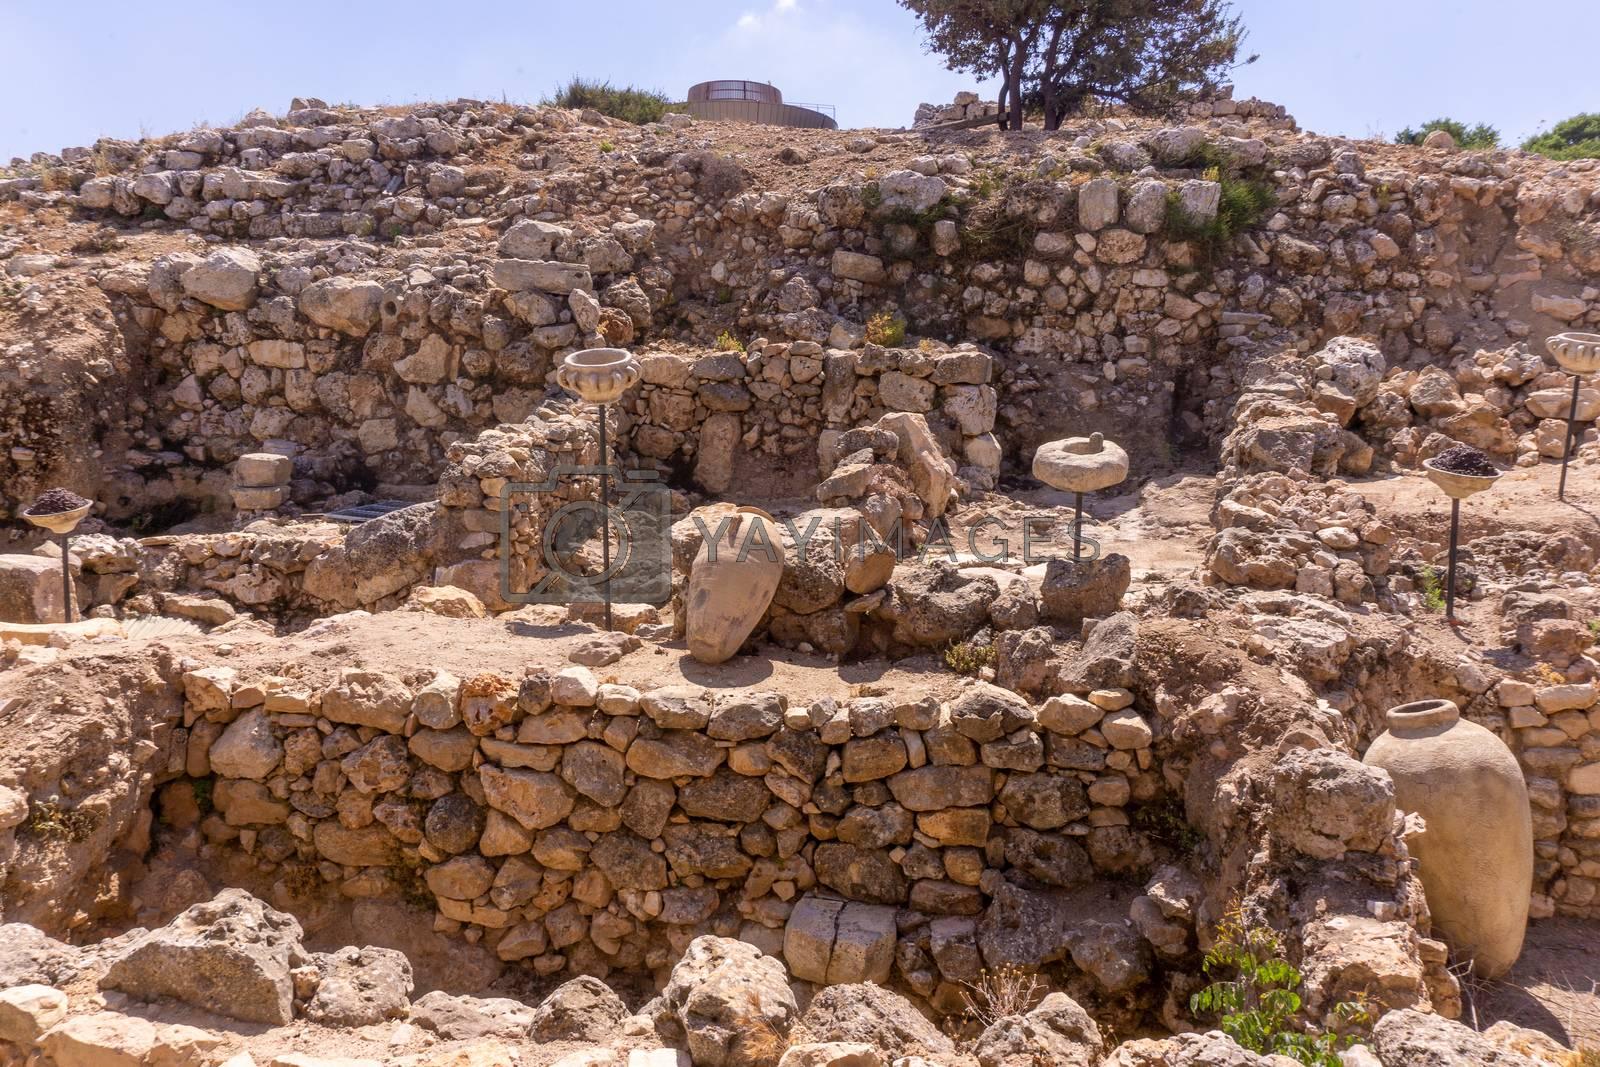 Biblical Shiloh ruins of historic town in Samaria